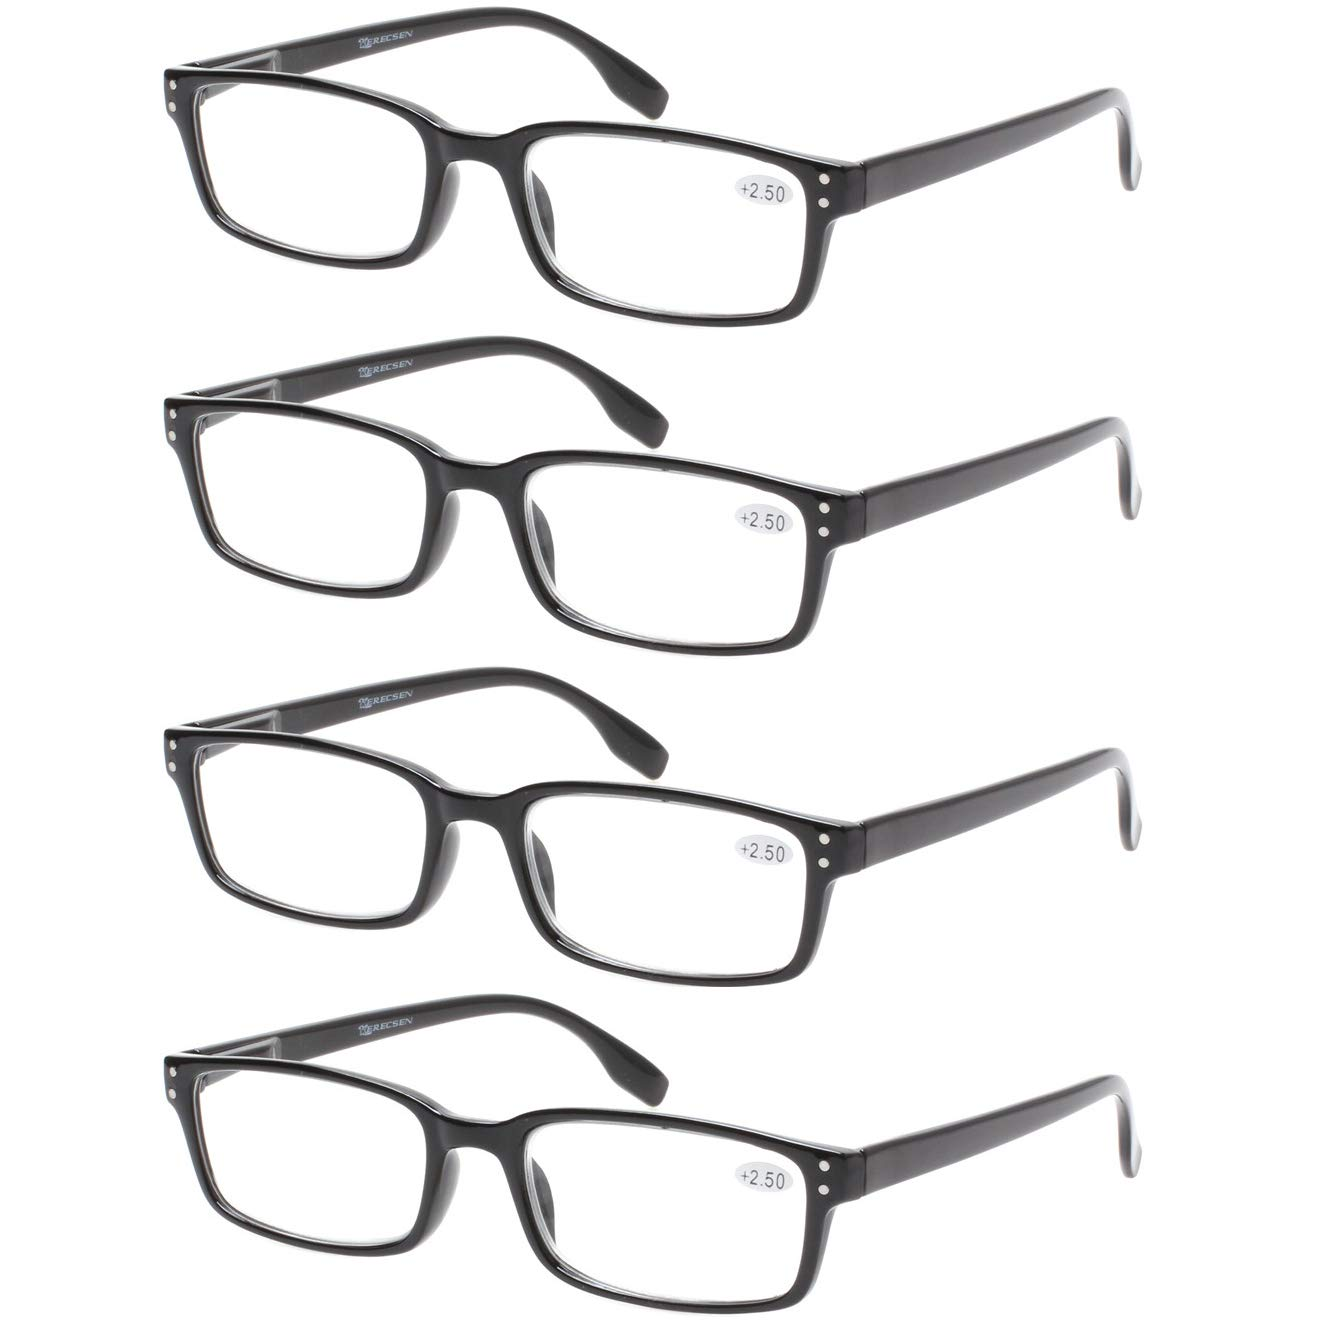 READING GLASSES 4 Pack Spring Hinge Comfort Readers Plastic Includes Sun Readers